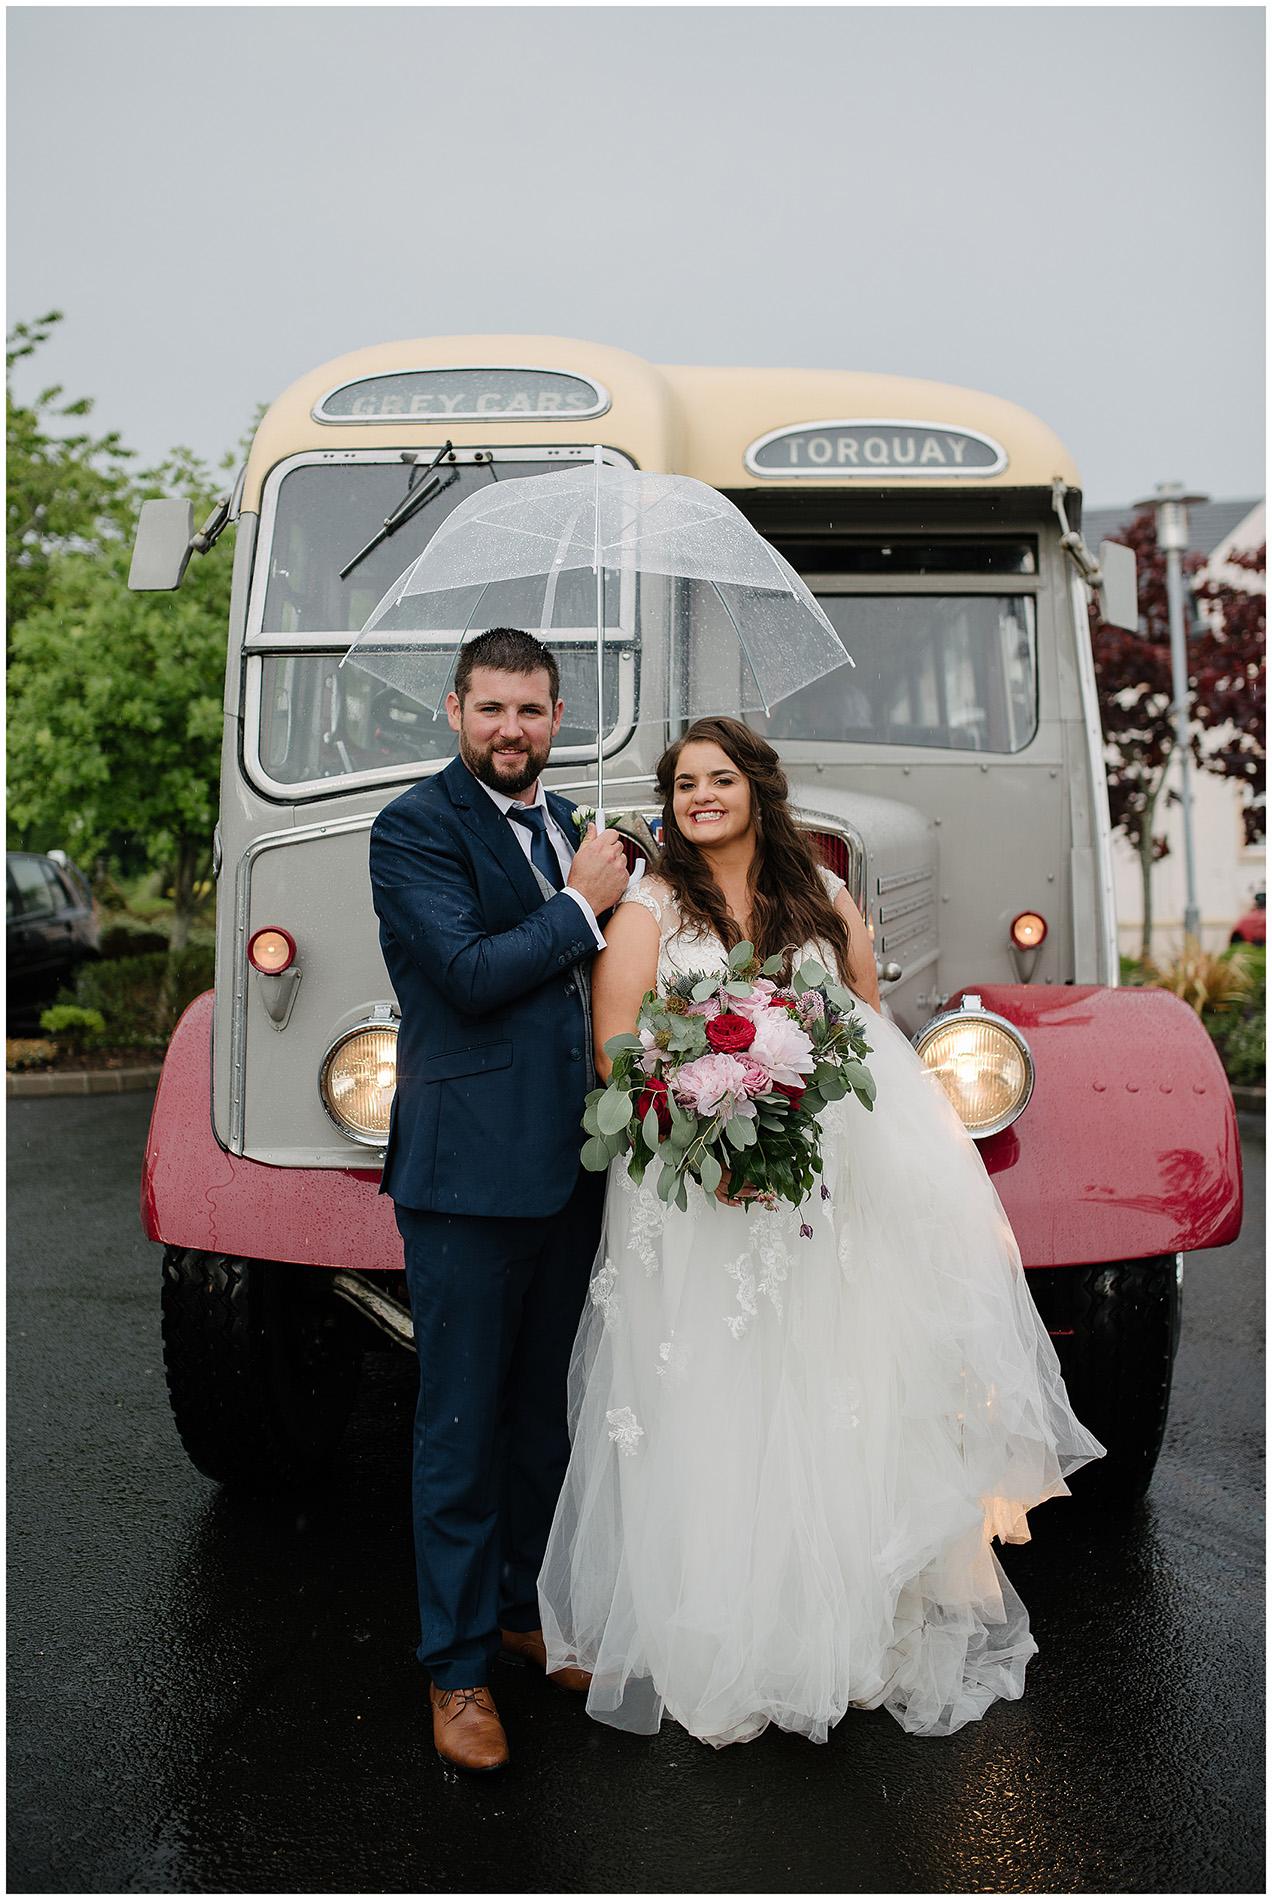 redcastle-hotel-wedding-karen-brian-jude-browne-photography-106.jpg